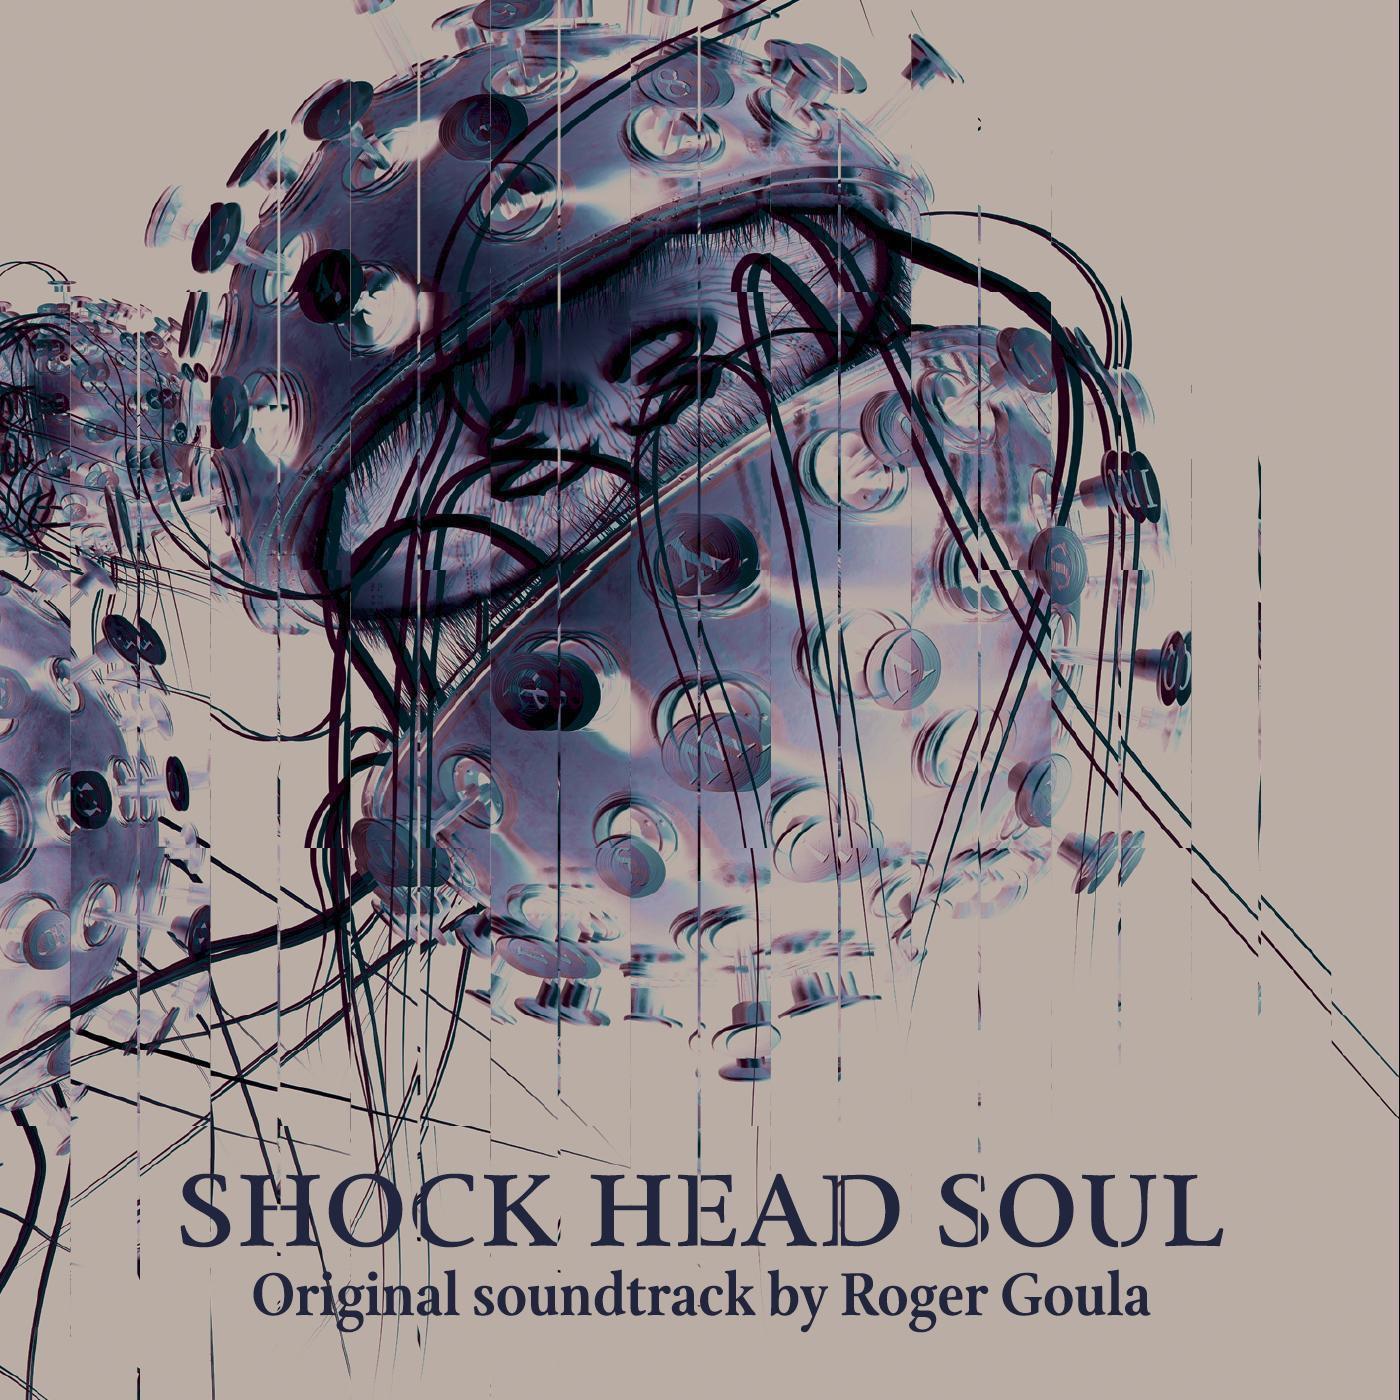 Shock Head Soul (Original Soundtrack)